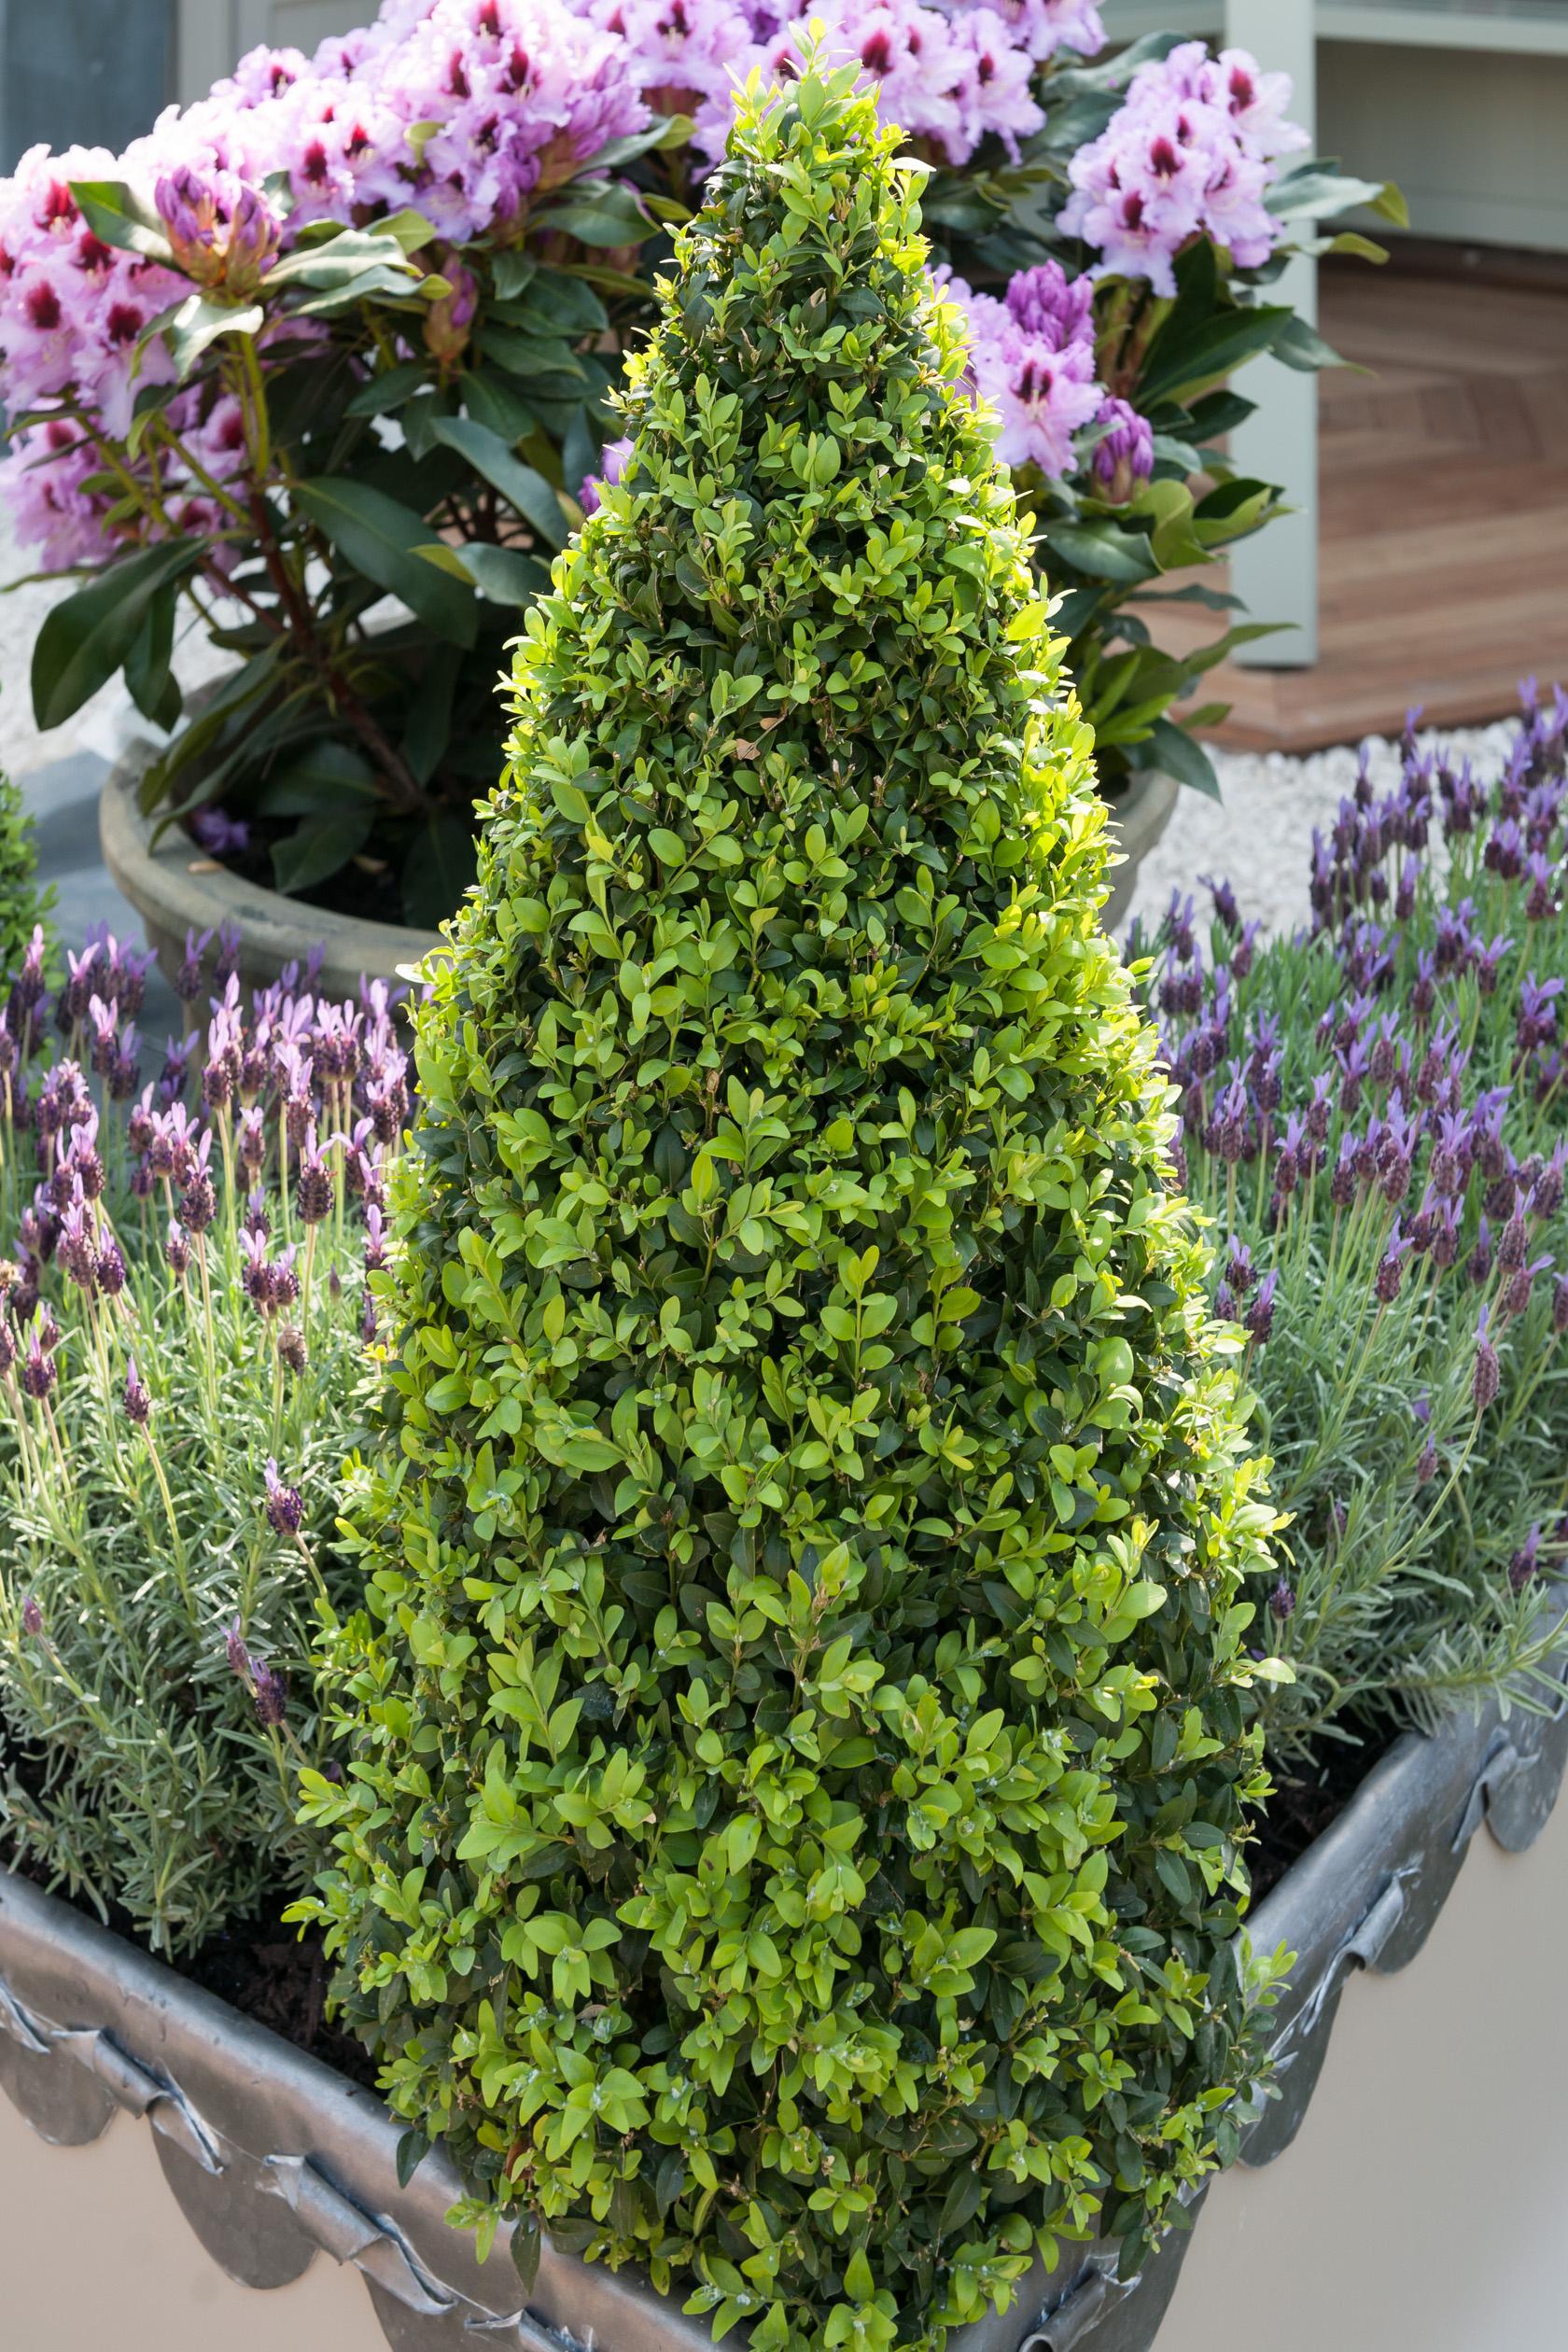 Buis Commun 'pyramidalis' - Buis - Arbuste - Arbre, Arbuste ... avec Arche Jardin Jardiland